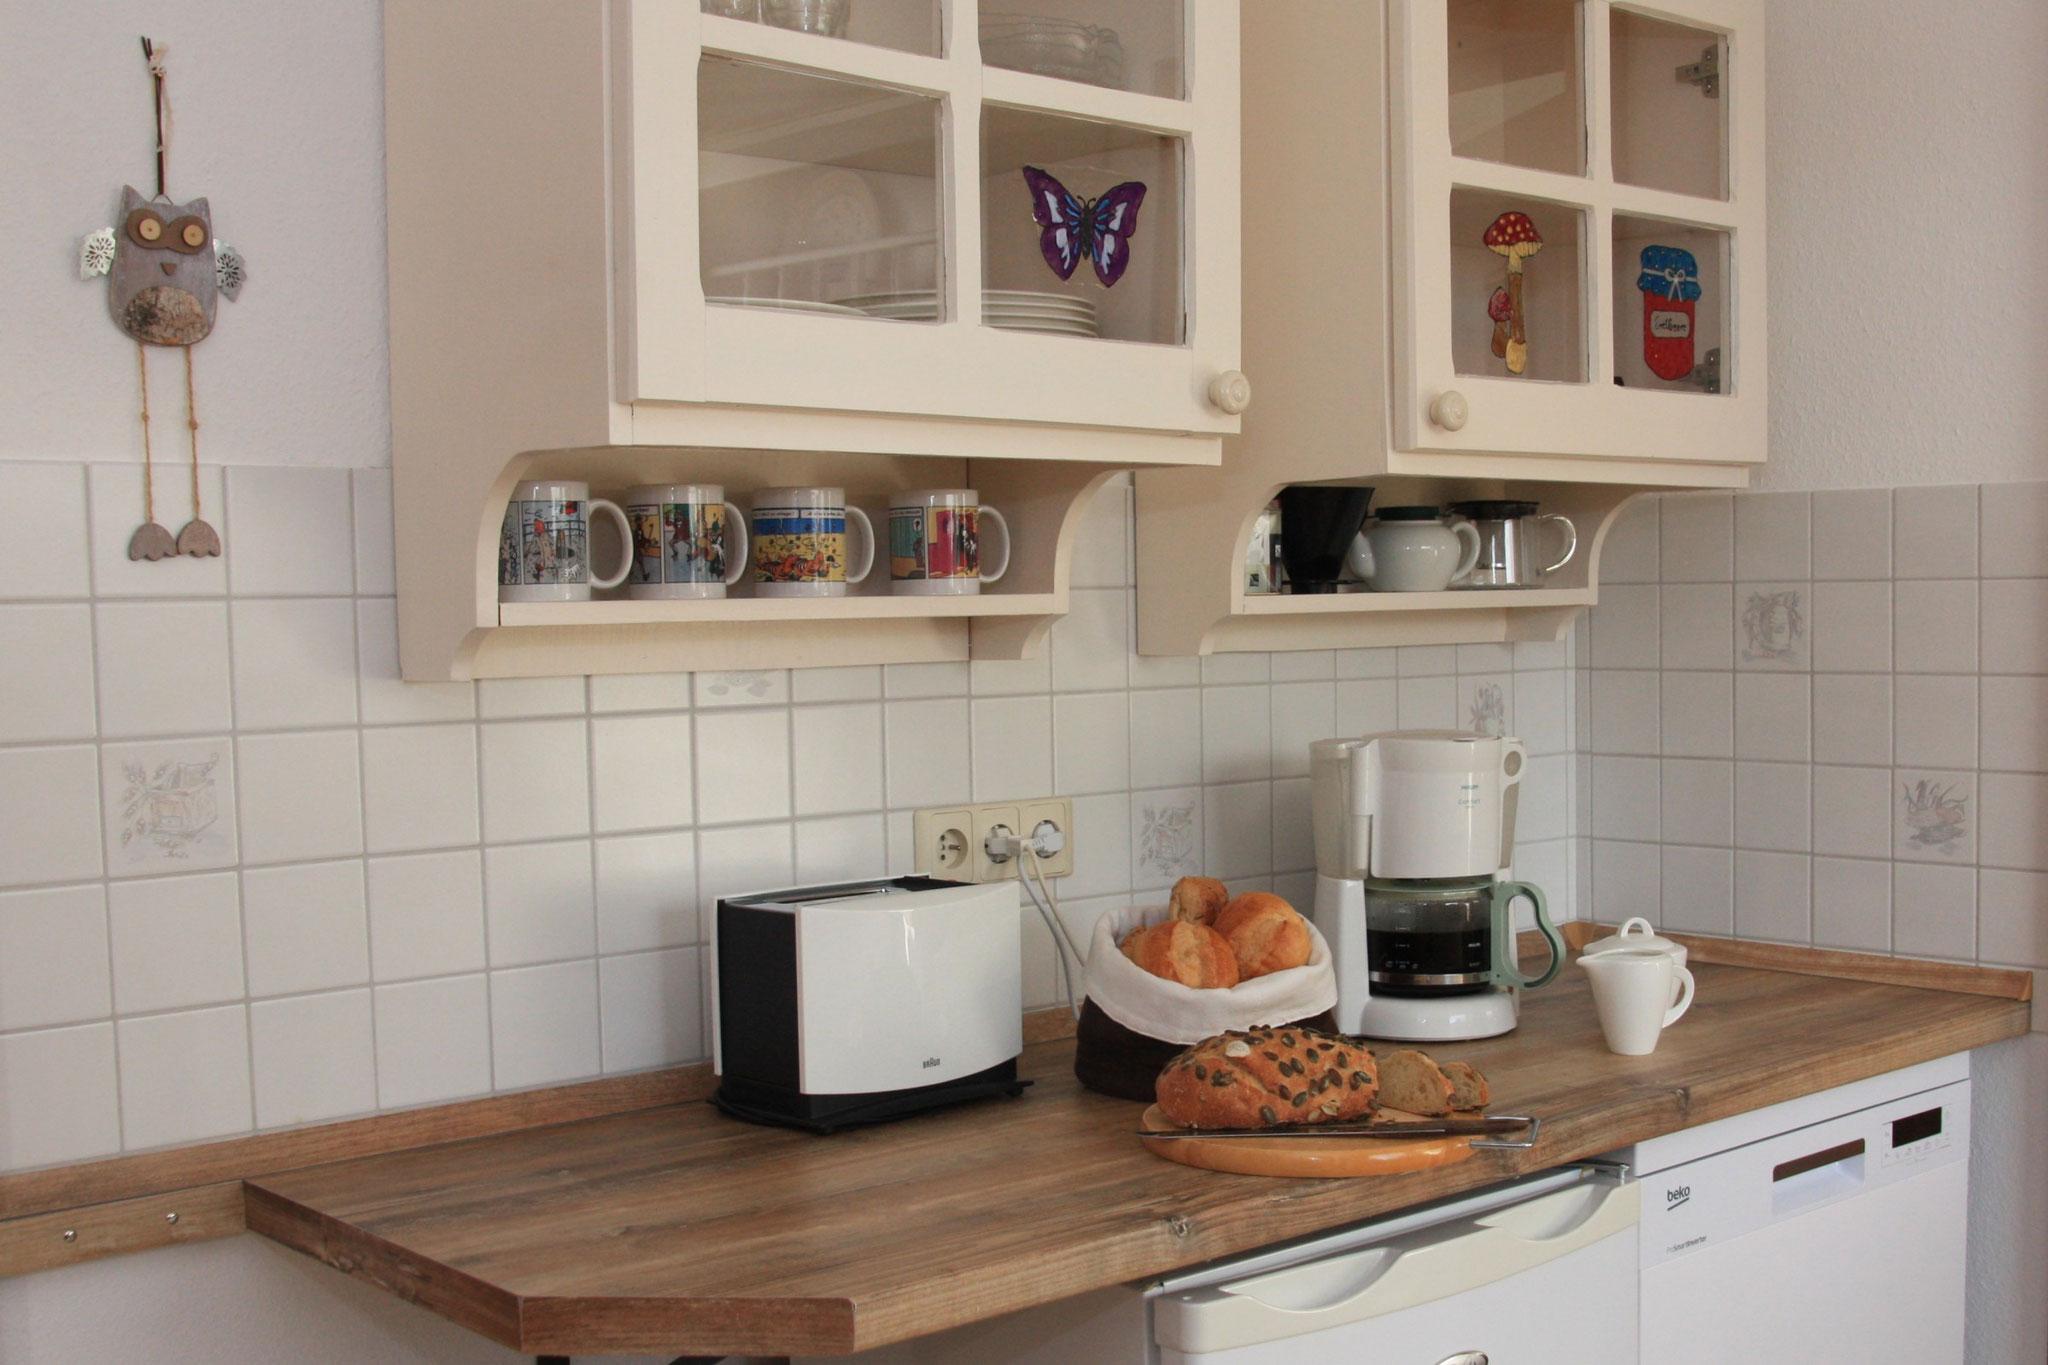 Die Küche – gut ausgestattet und mit persönlicher Note  |  De keuken – goed ingericht en met persoonlijke noot